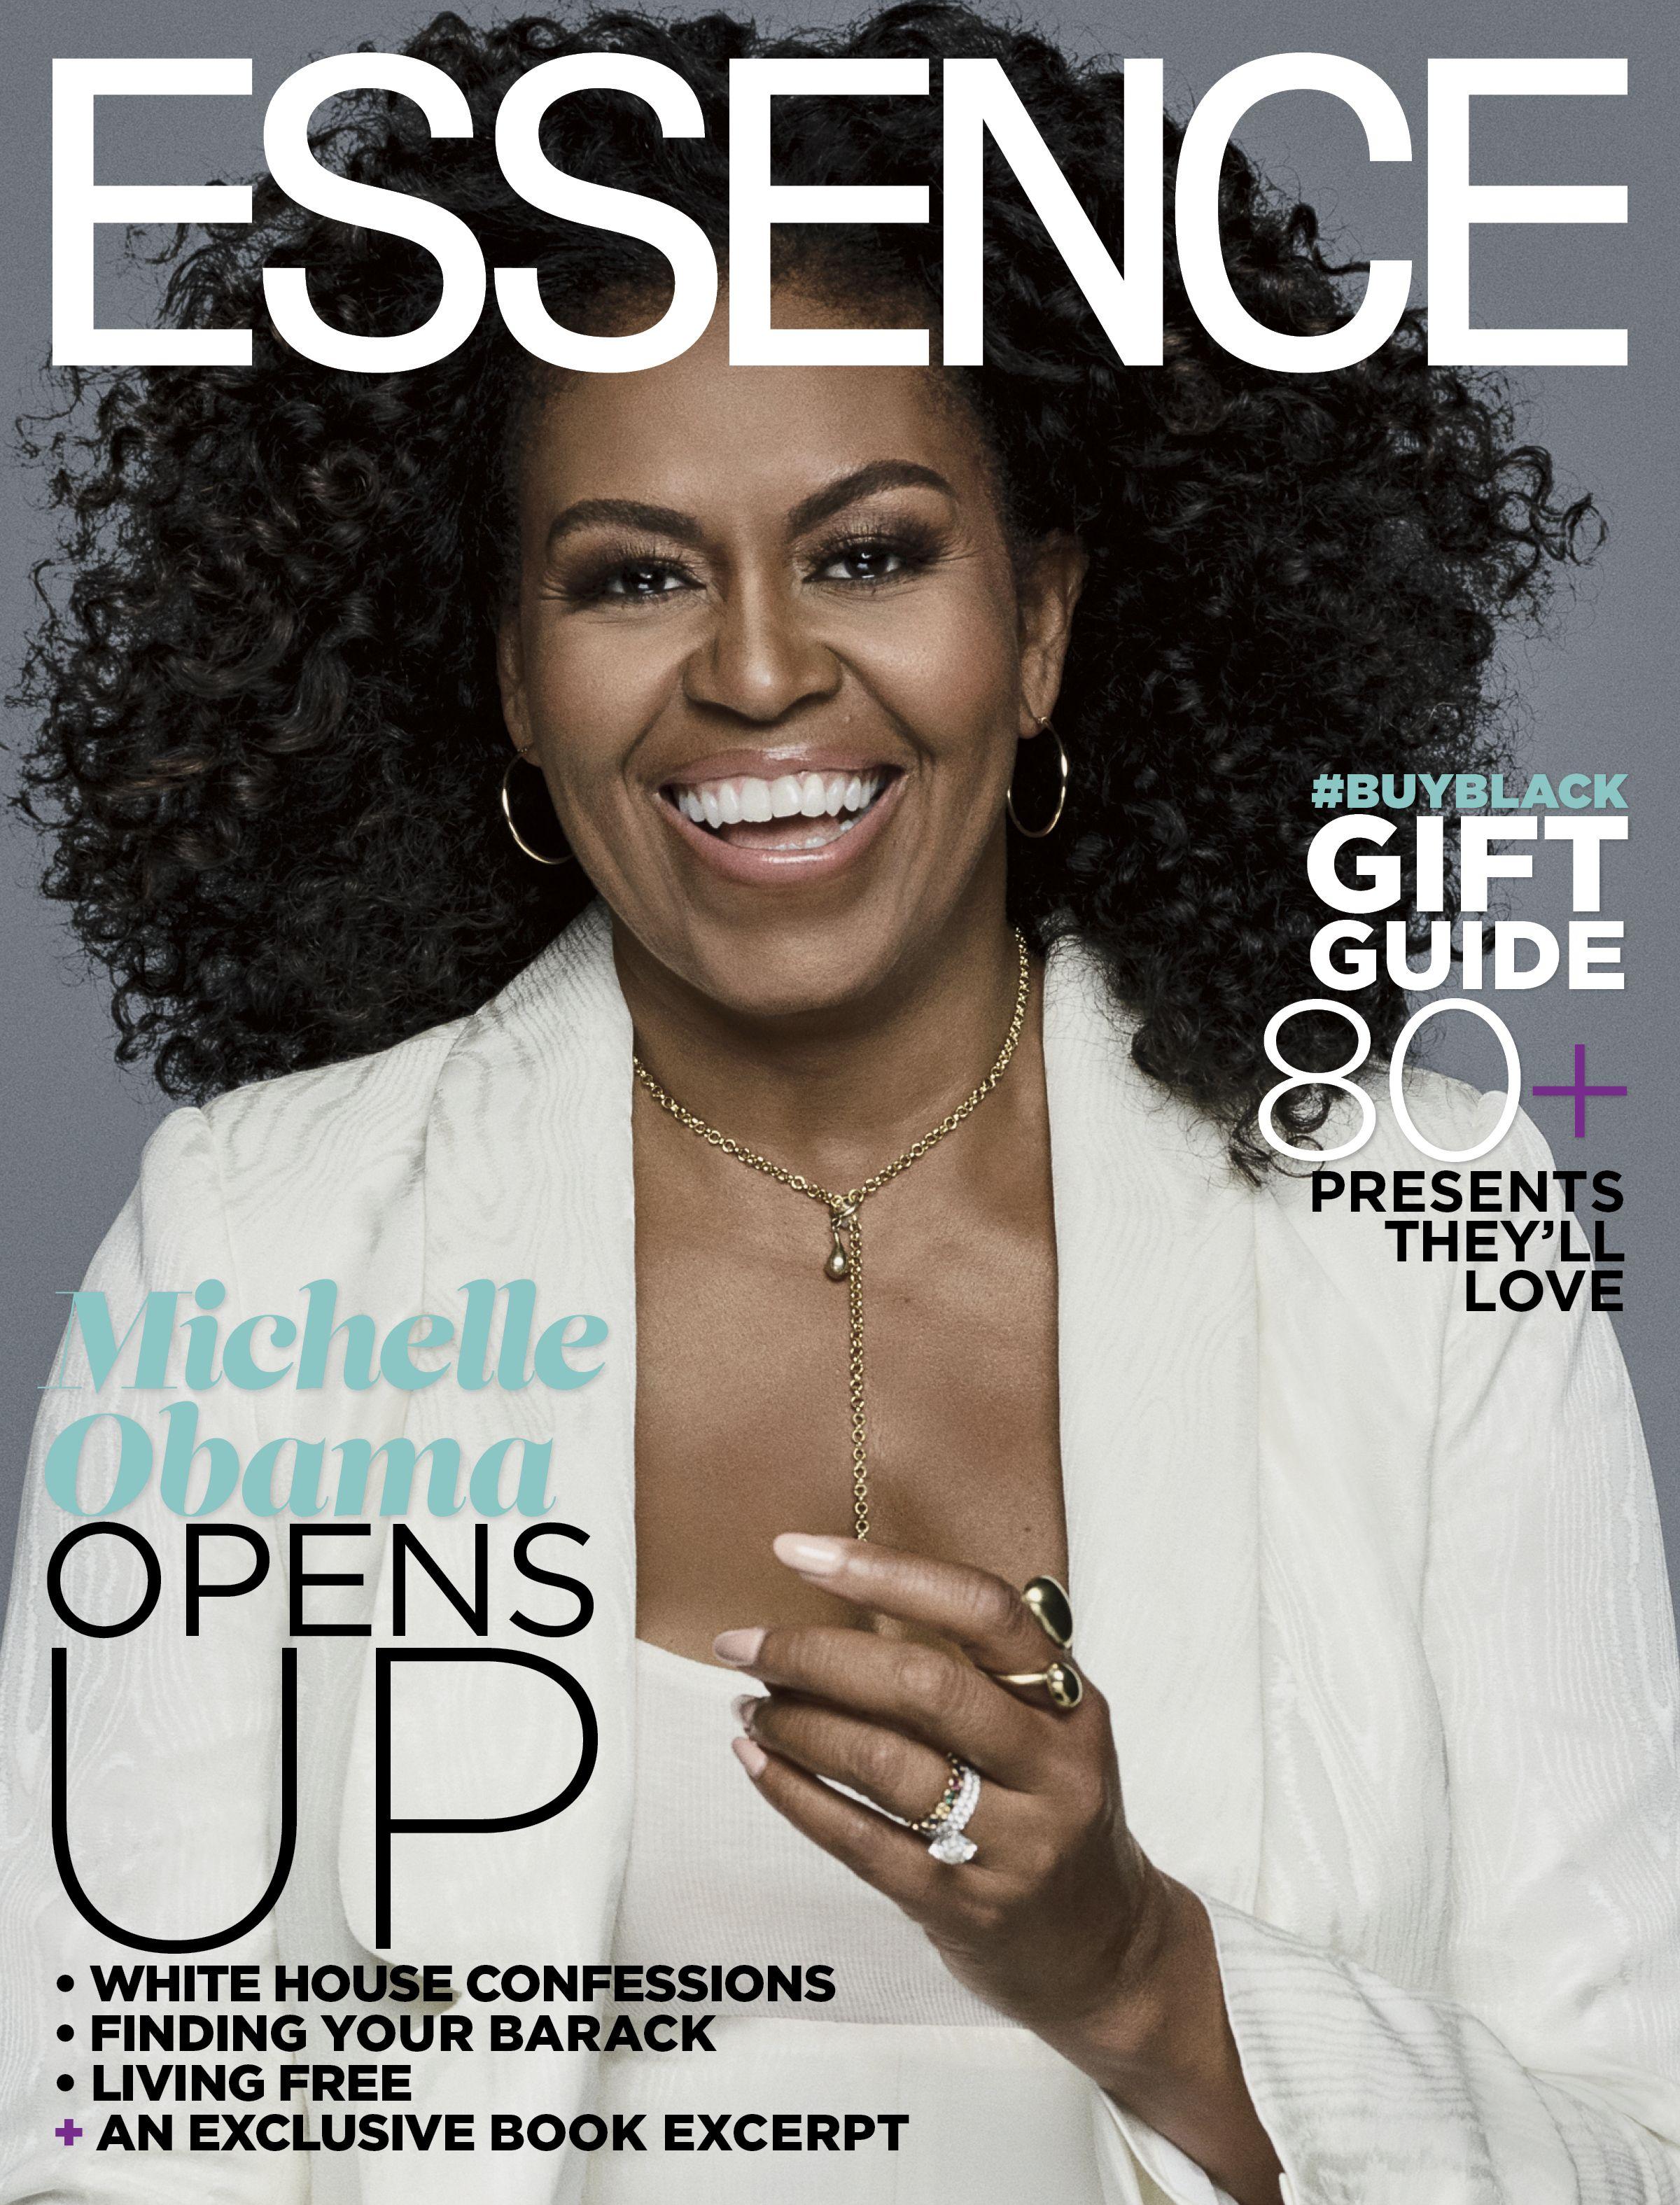 MichelleObamaCoversEssence